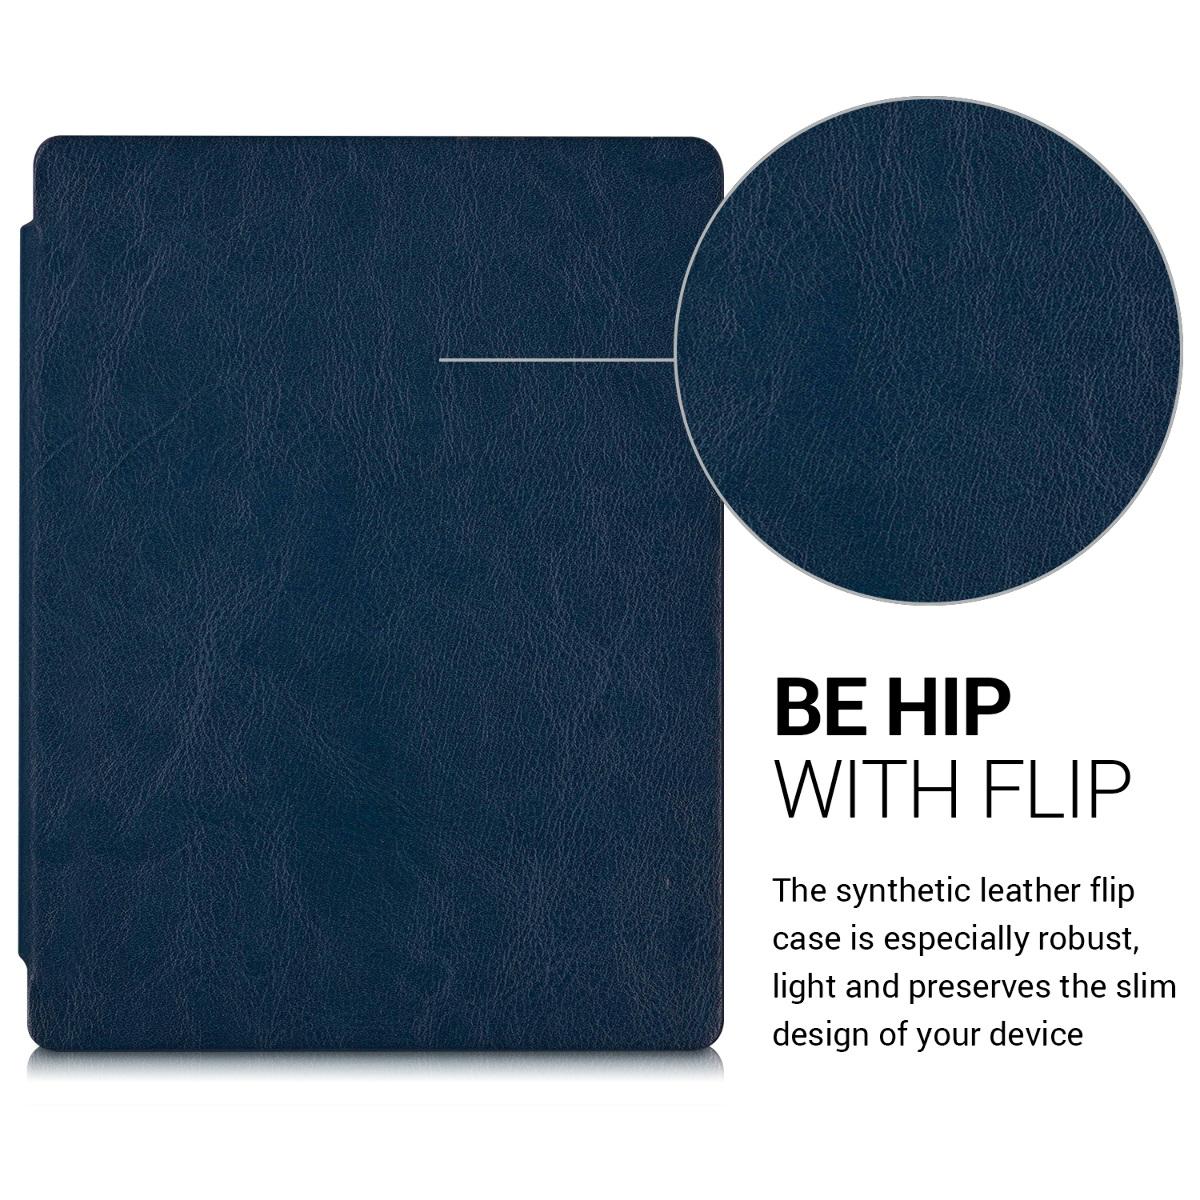 Flip cover for kobo aura h2o edition 2 dark blue for Housse kobo aura h2o edition 2